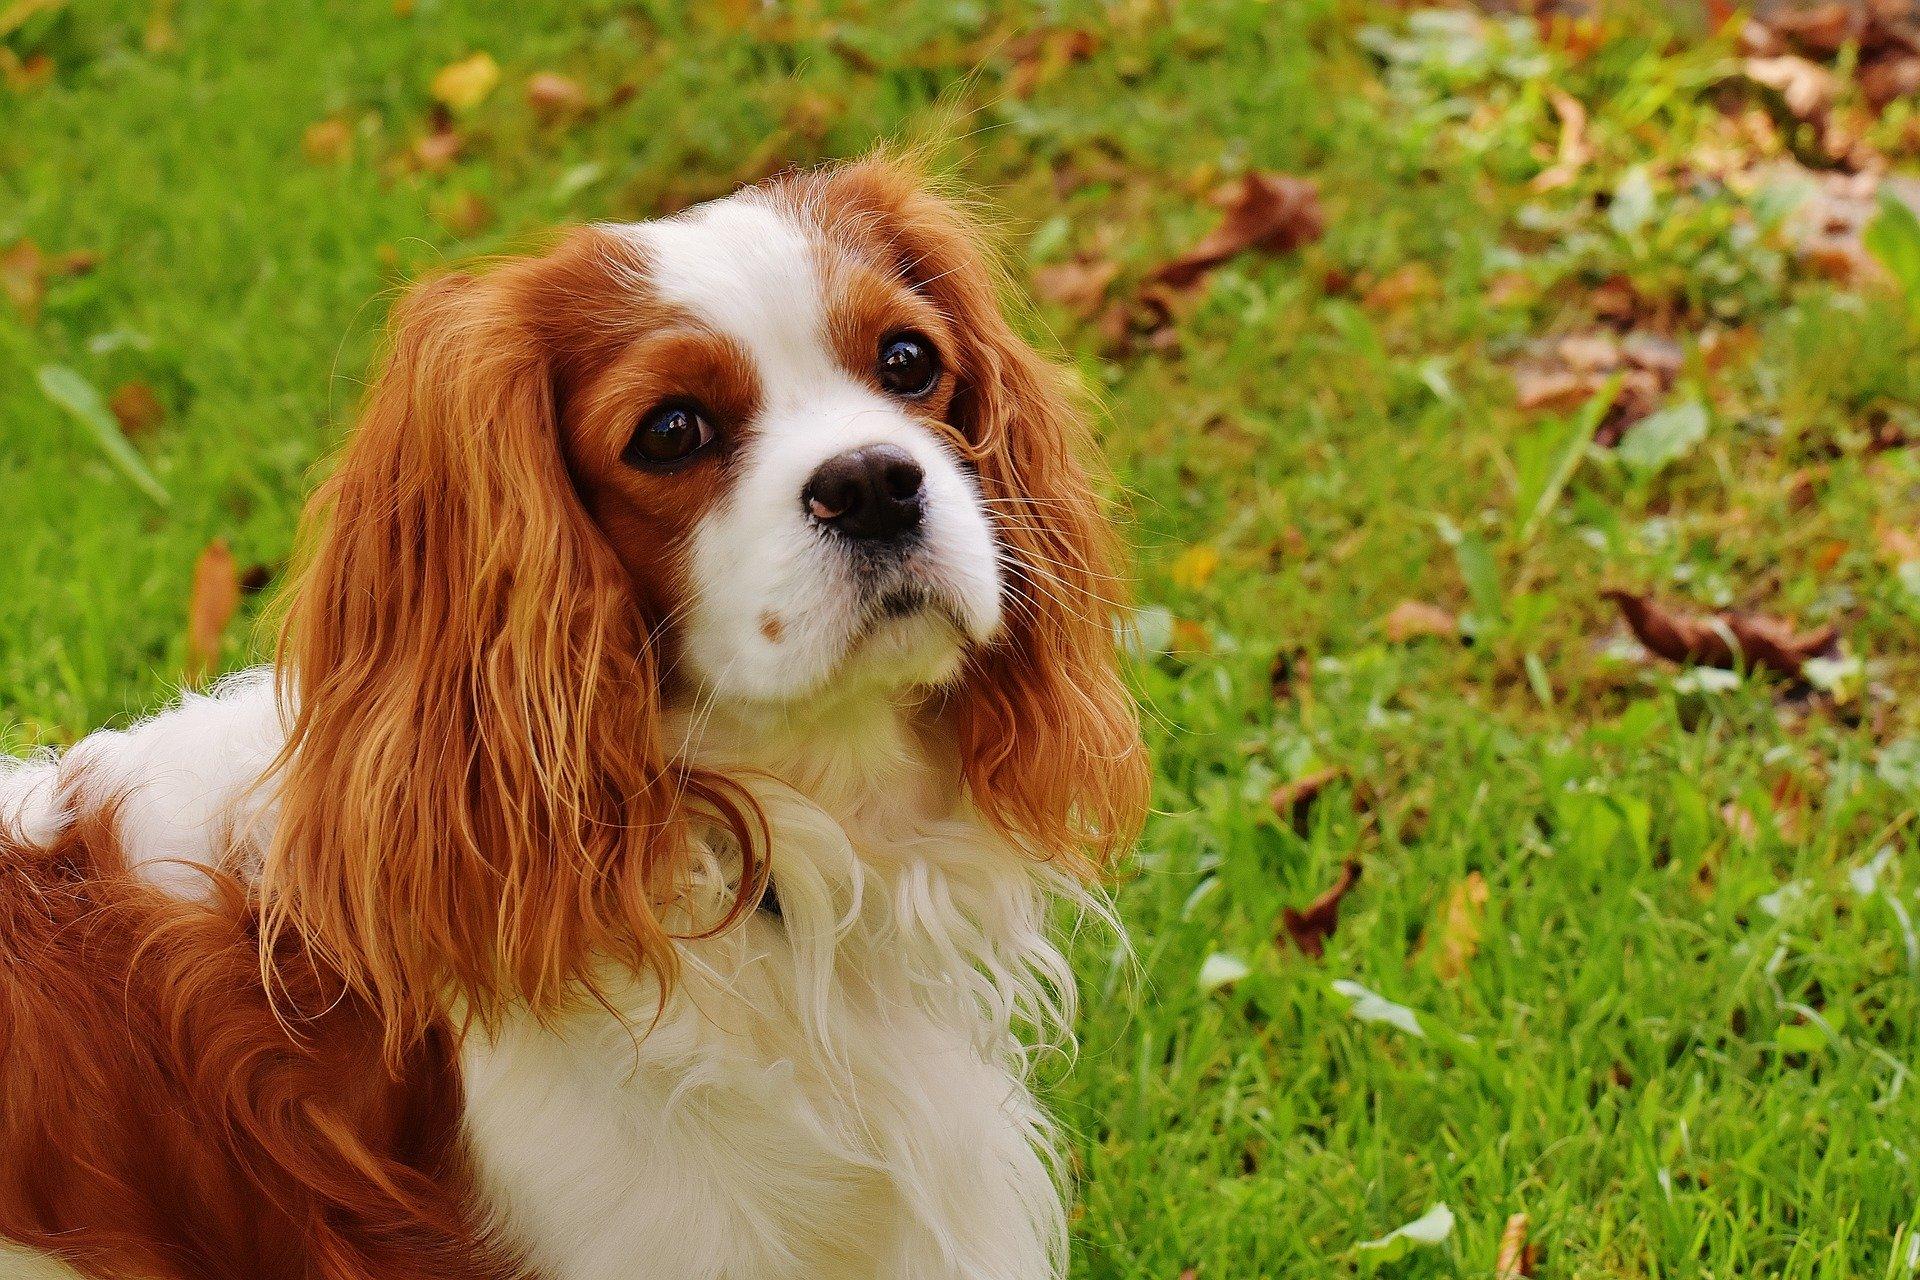 Dog disease: Meningitis in Dogs Symptoms and Treatment